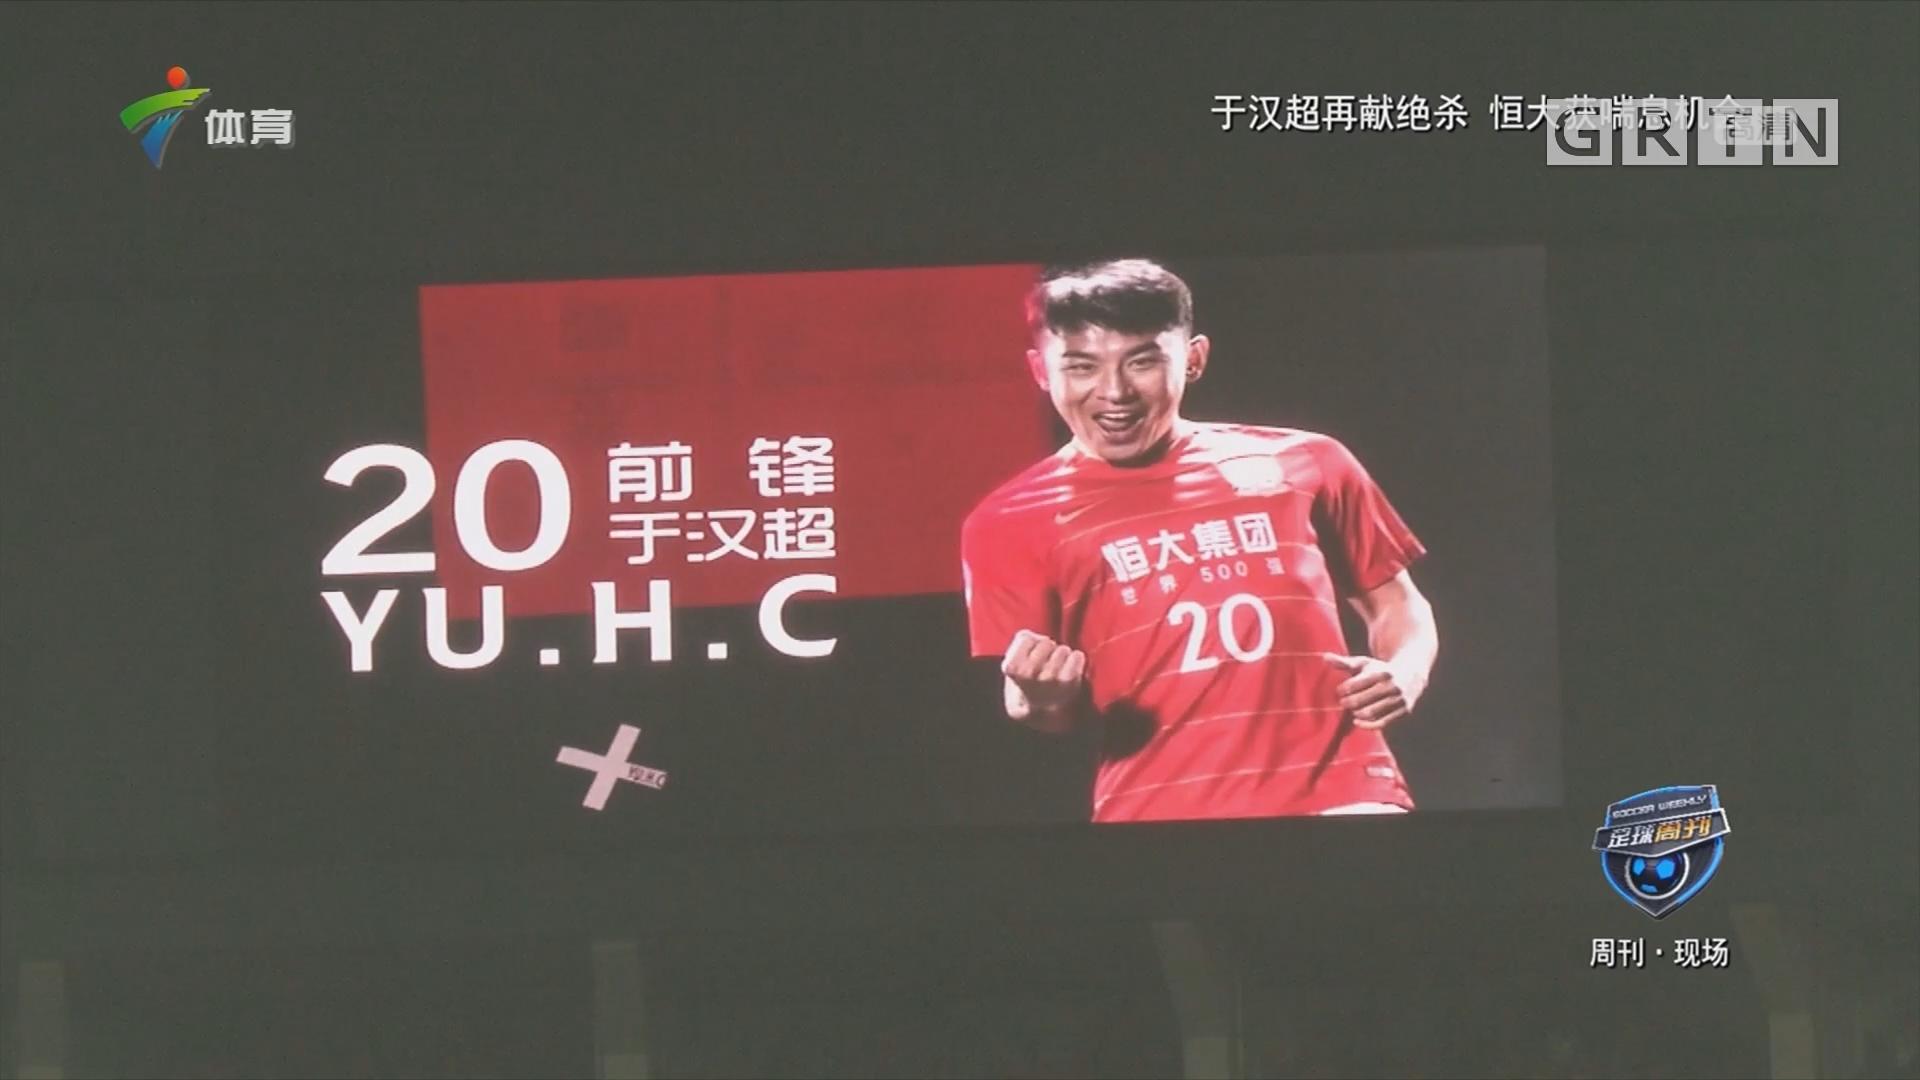 [HD][2018-04-30]足球星视界:于汉超再献绝杀 恒大获喘息机会